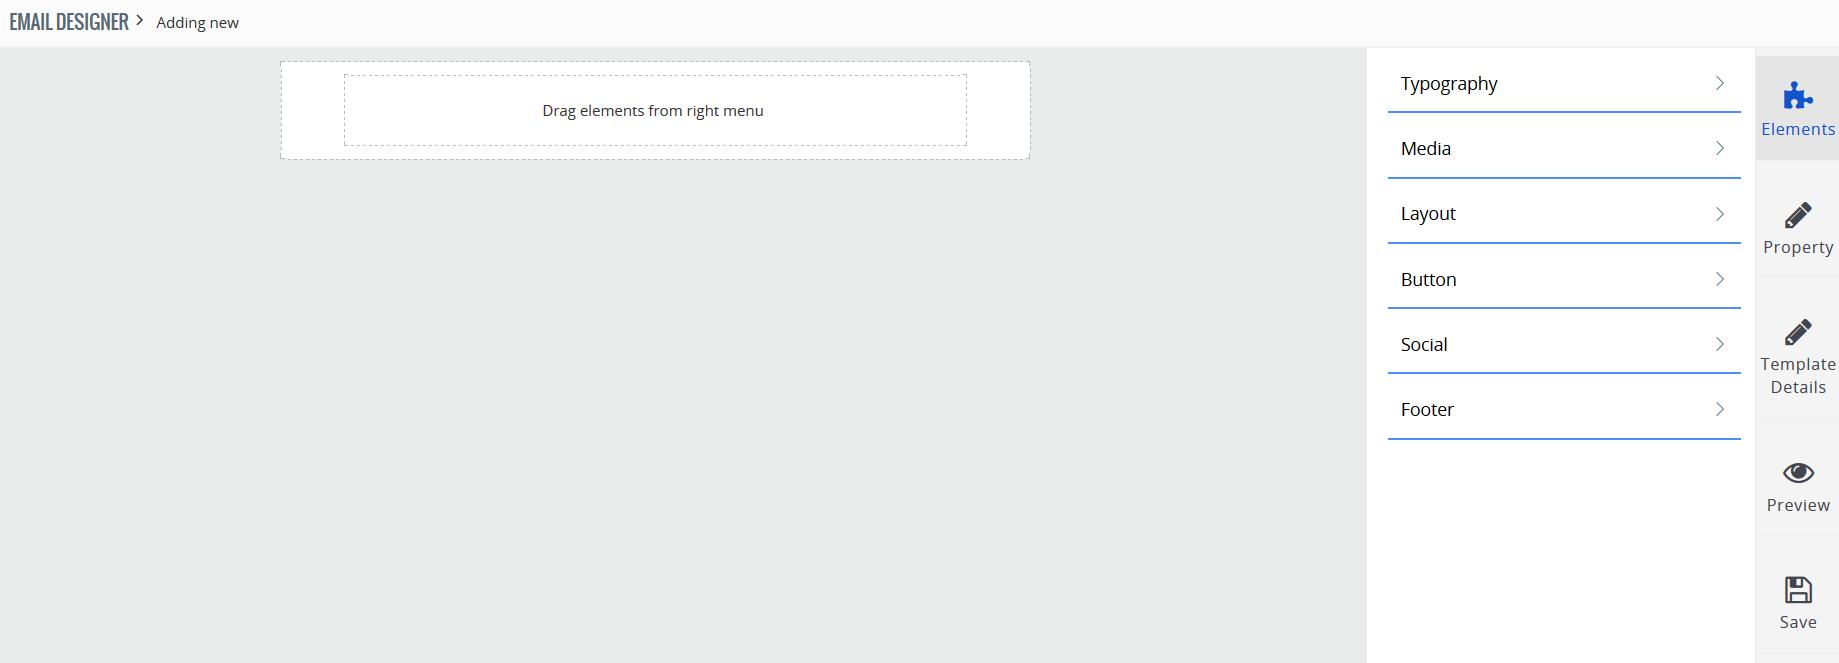 How to configure email designer in VTiger 7